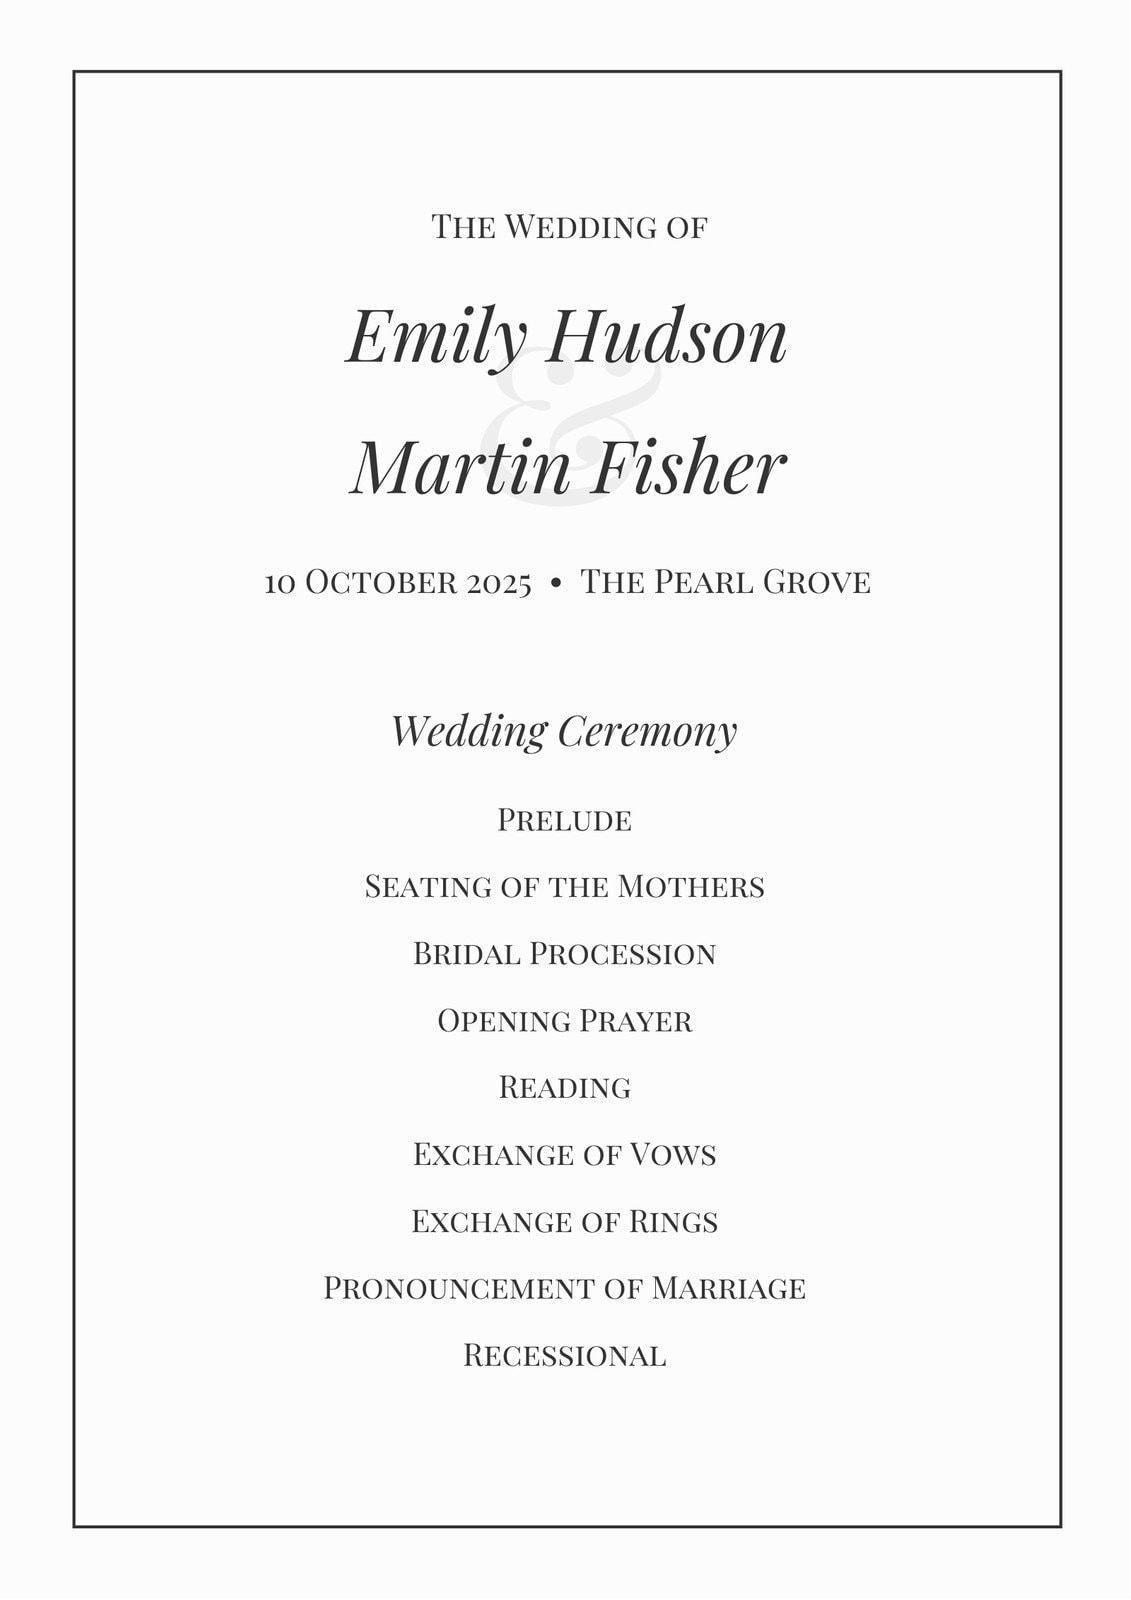 Black and White Classic Wedding Program